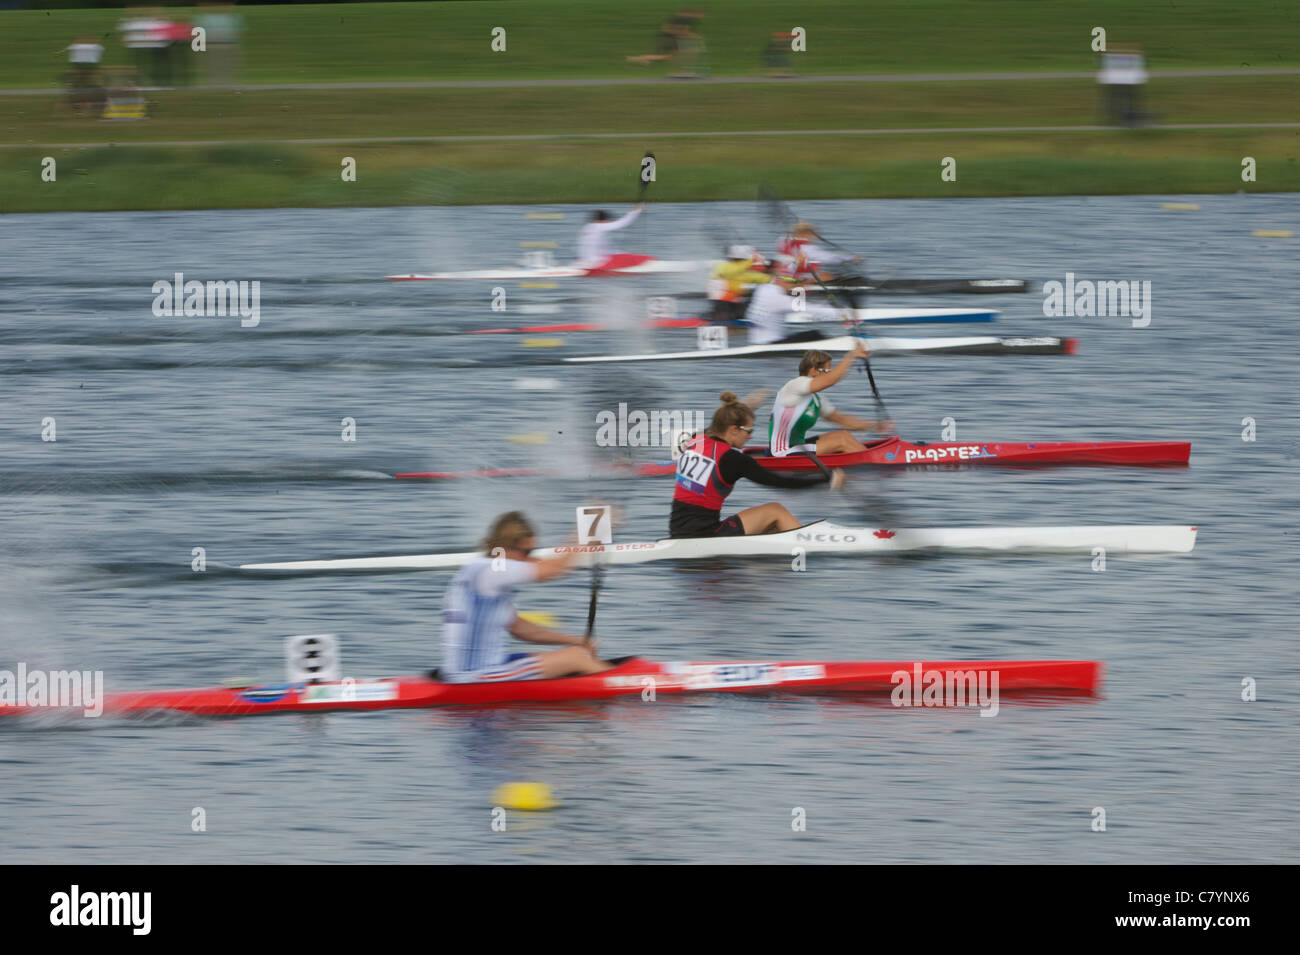 Competitors at start, Canoe Sprint Olympic Test Event, women's 200m K1, Eton Dorney Lake Eton Dorney, England - Stock Image